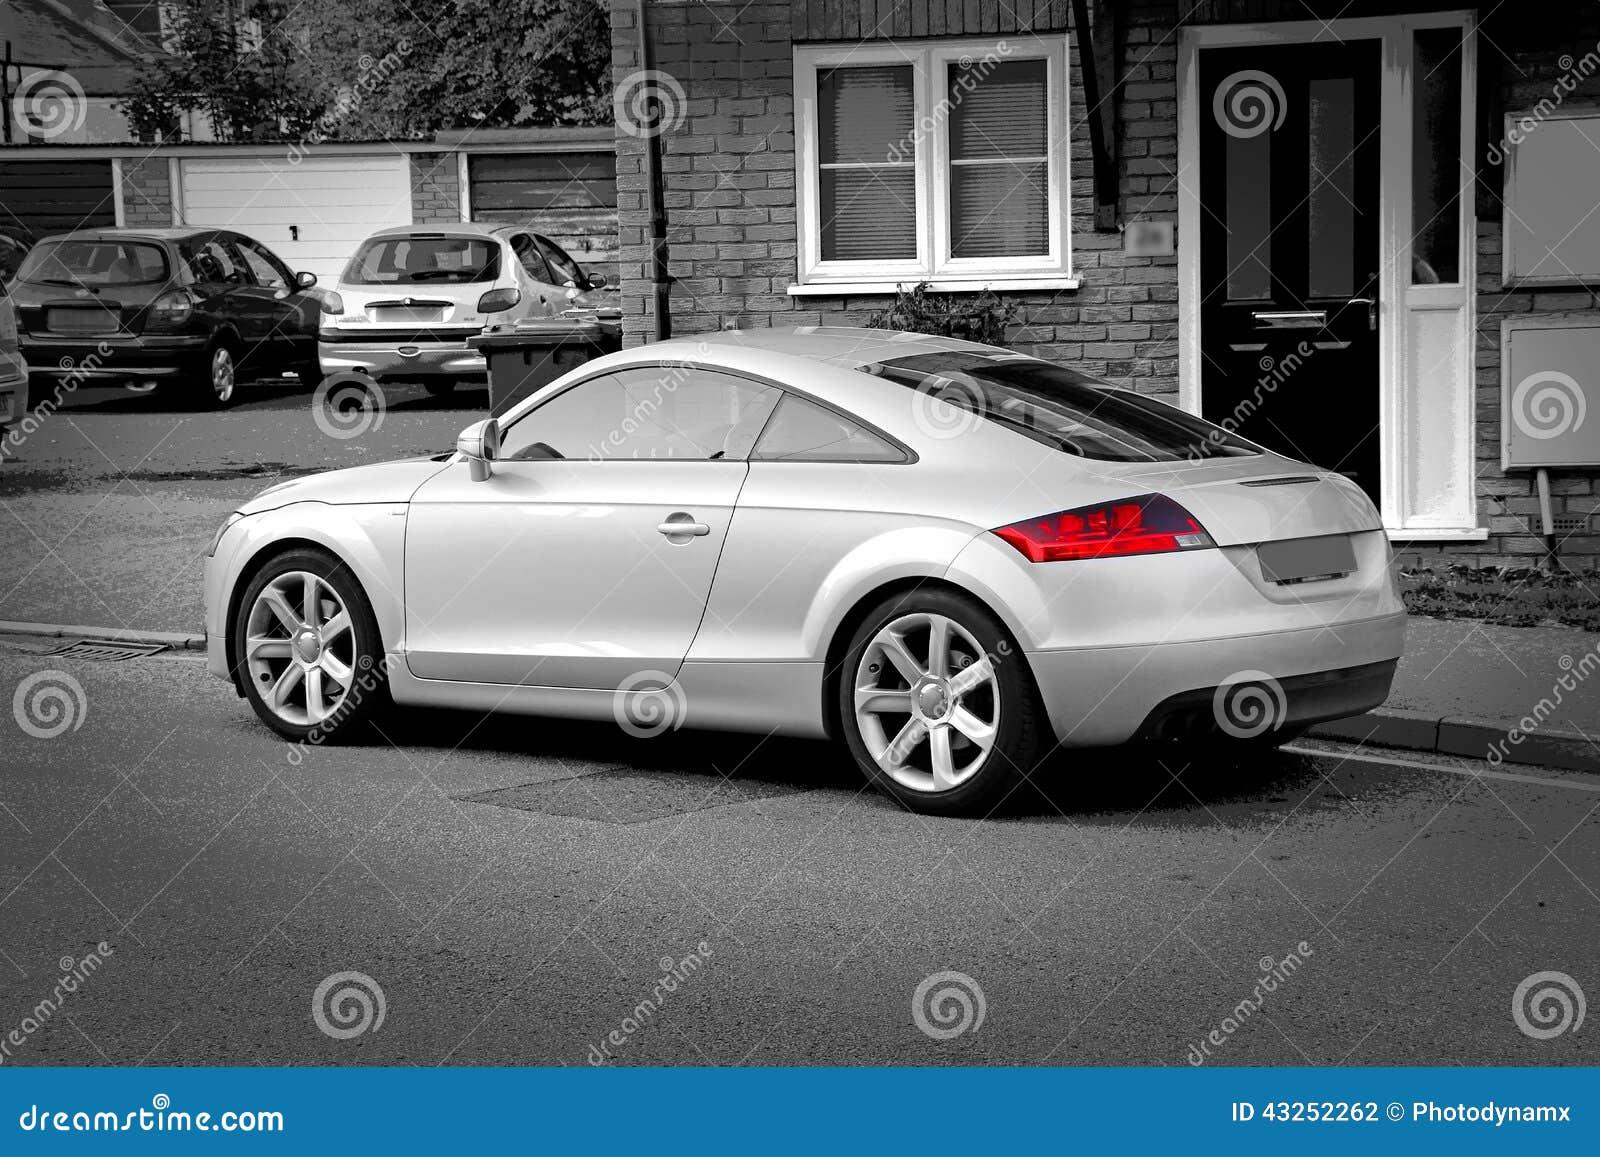 Автомобиль спорт amg Audi tt